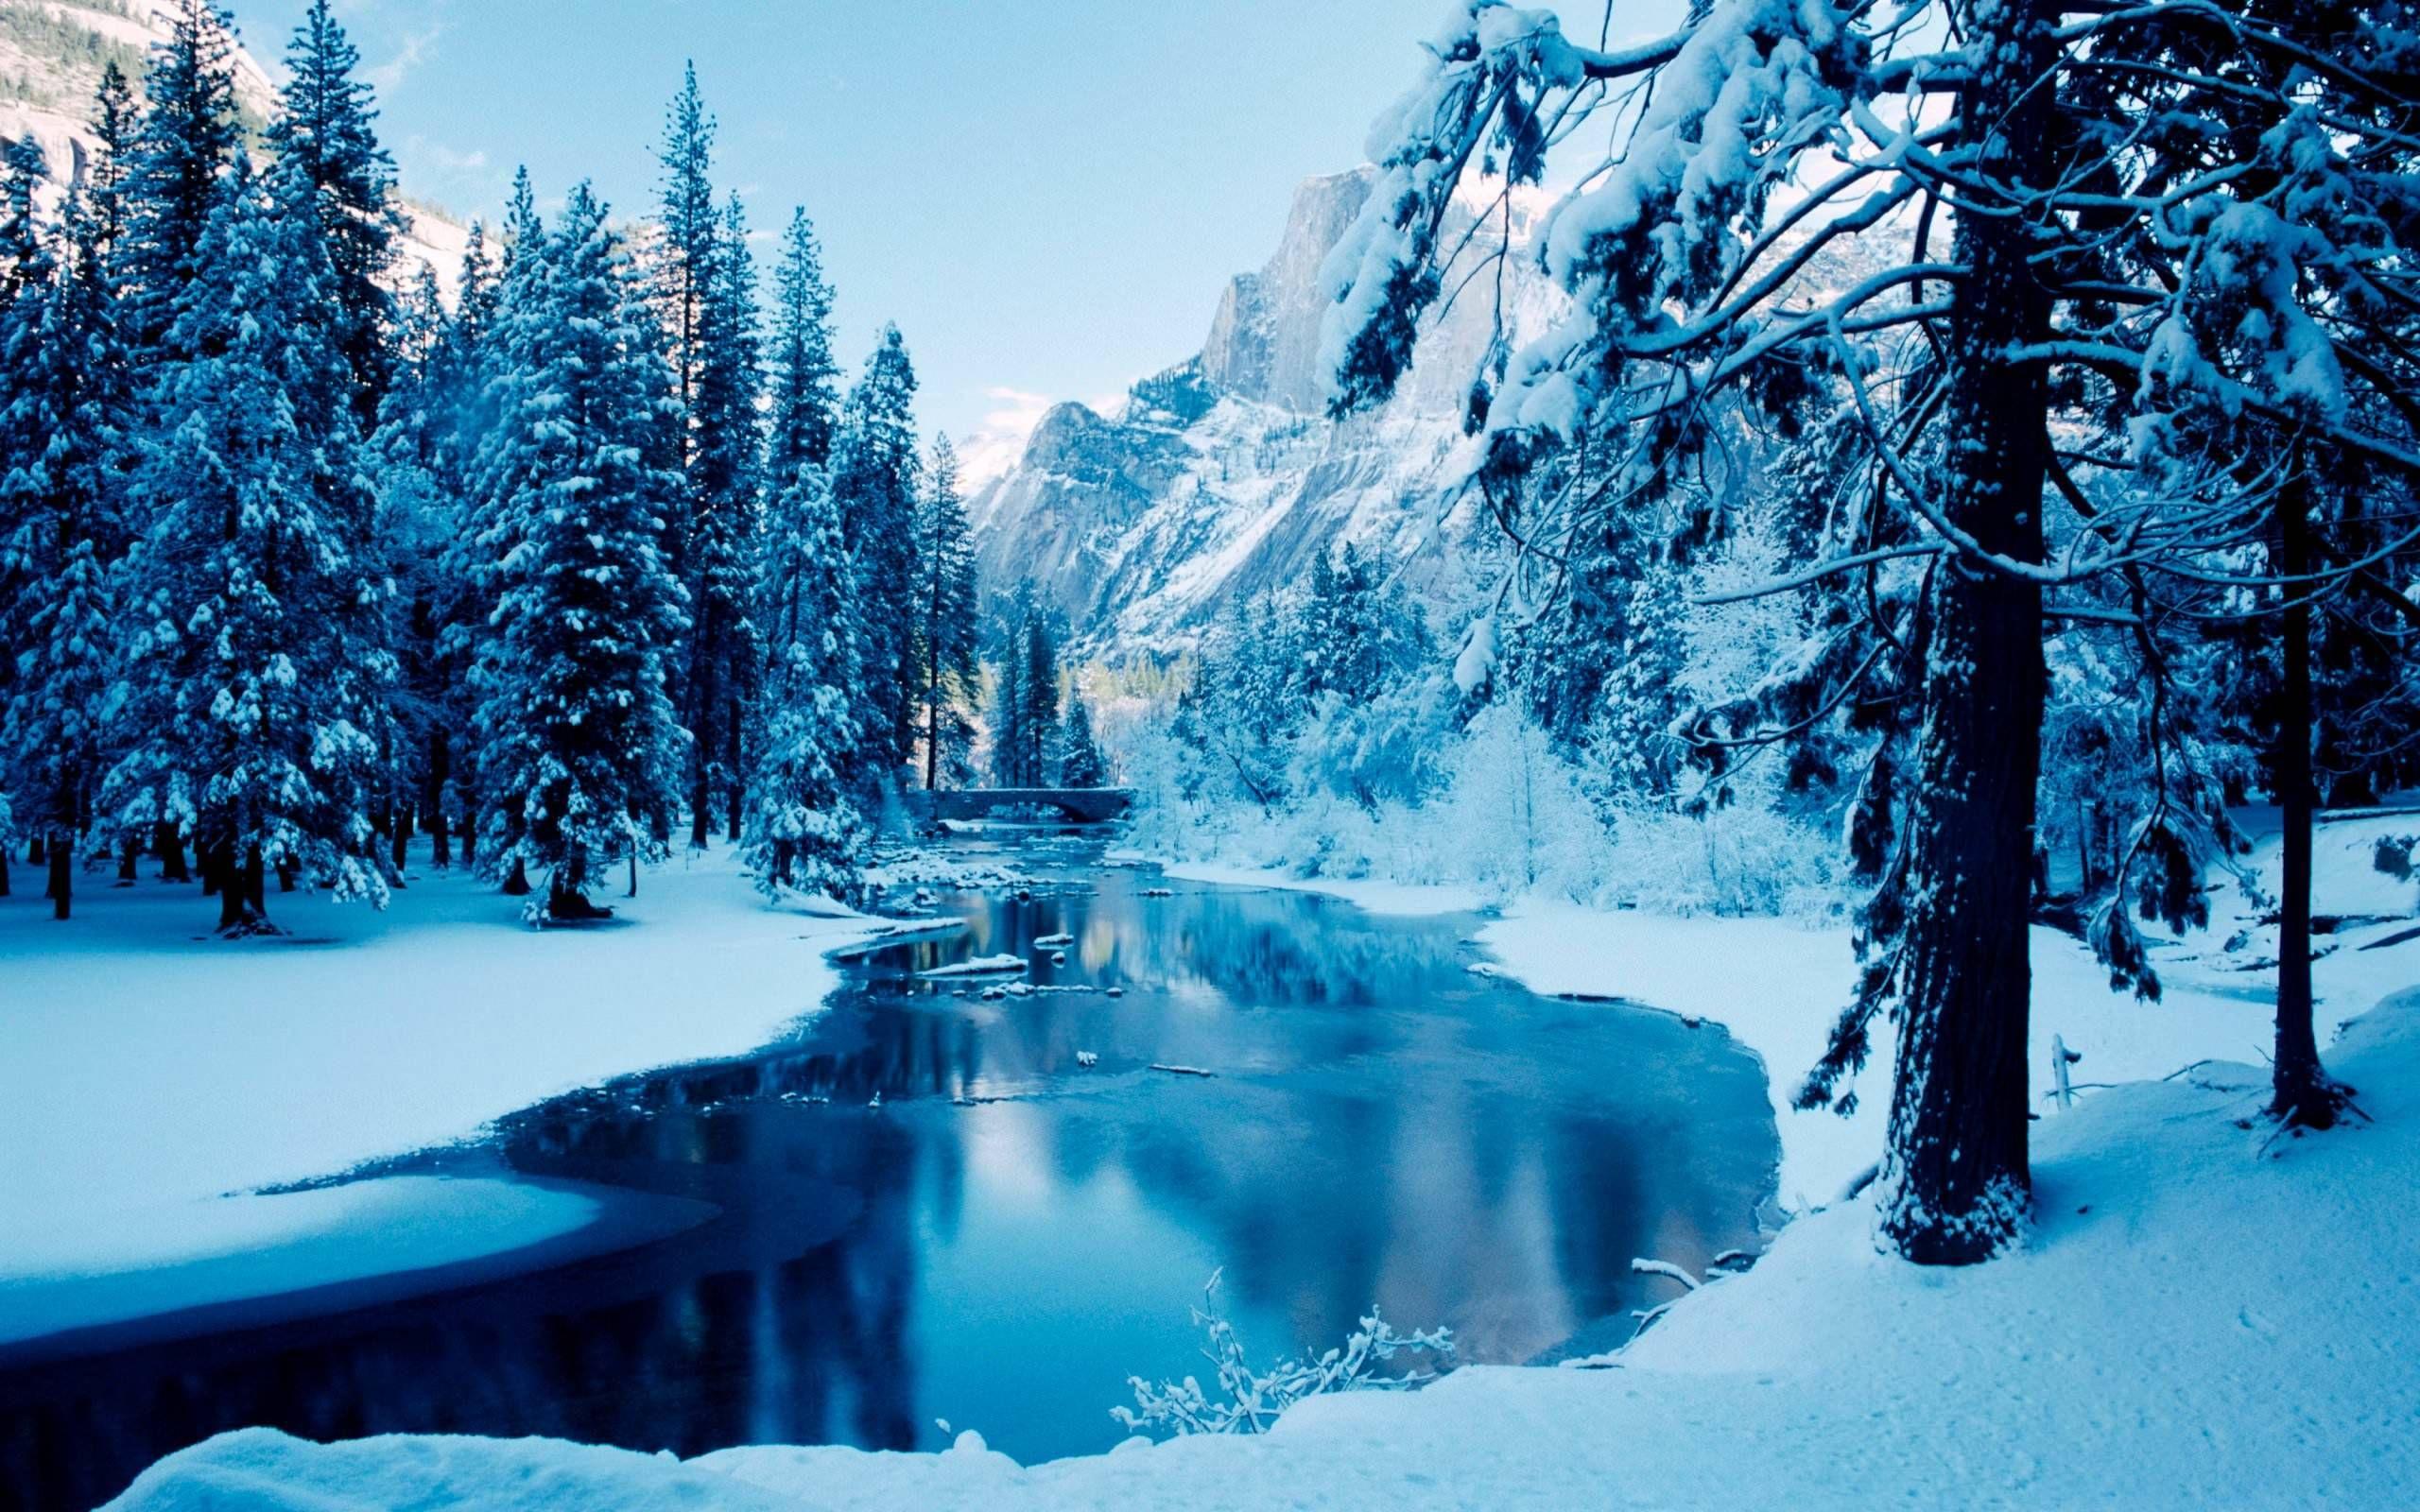 Winter backgrounds for desktop art wallpapers pinterest winter